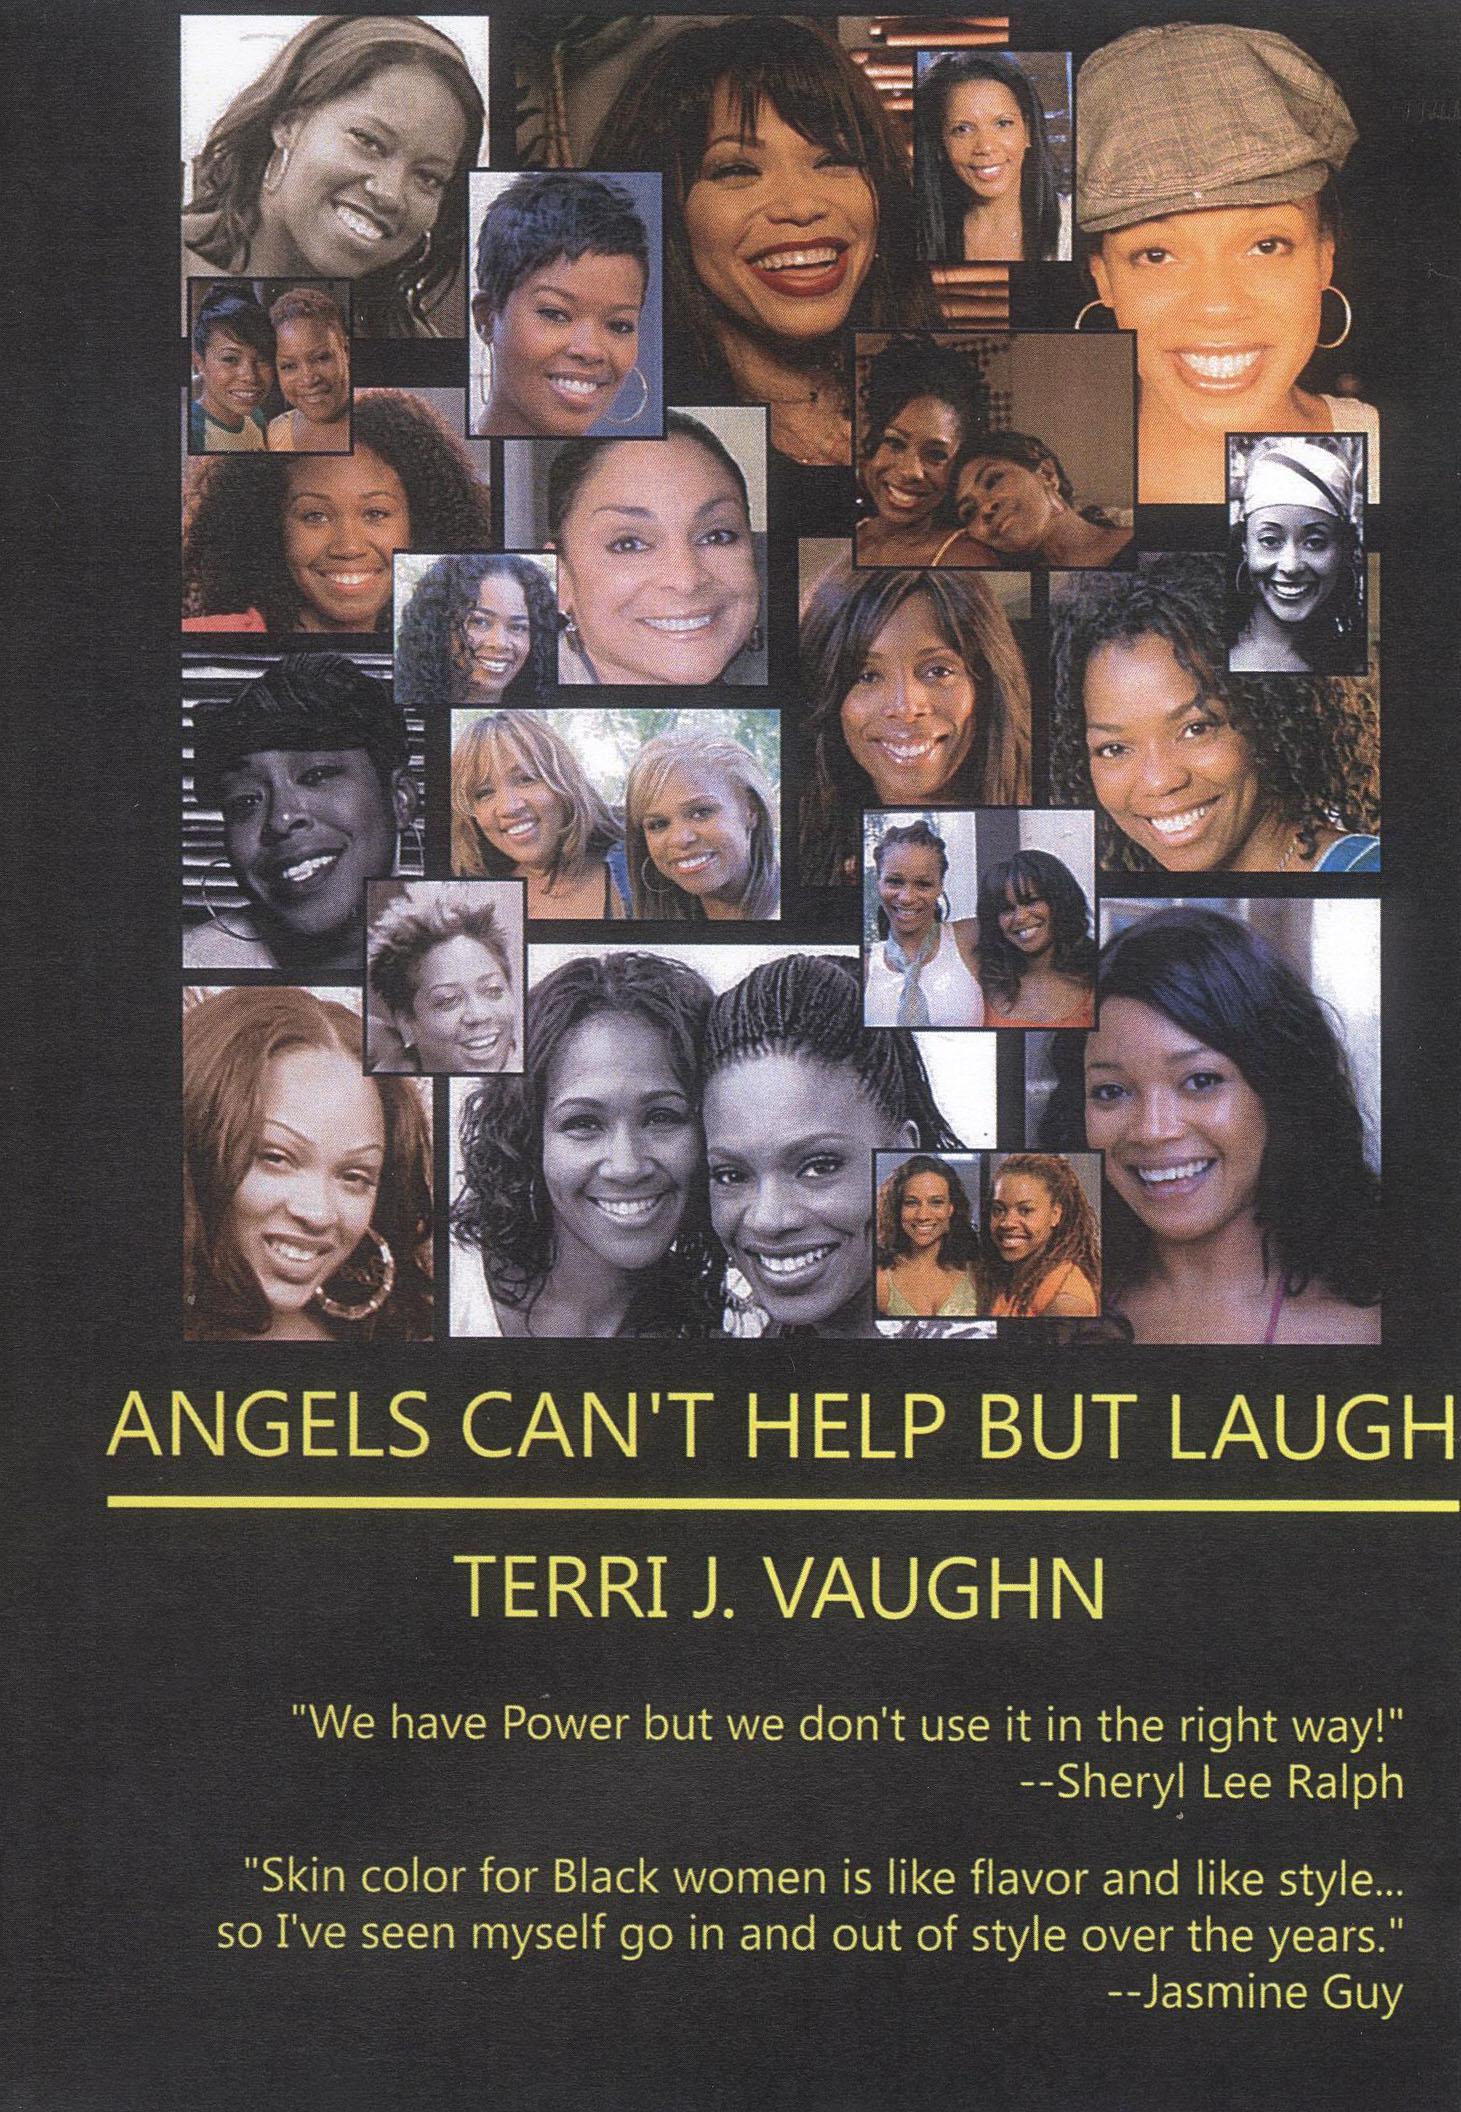 angels cant help but laugh 2006 thomas s burns jr